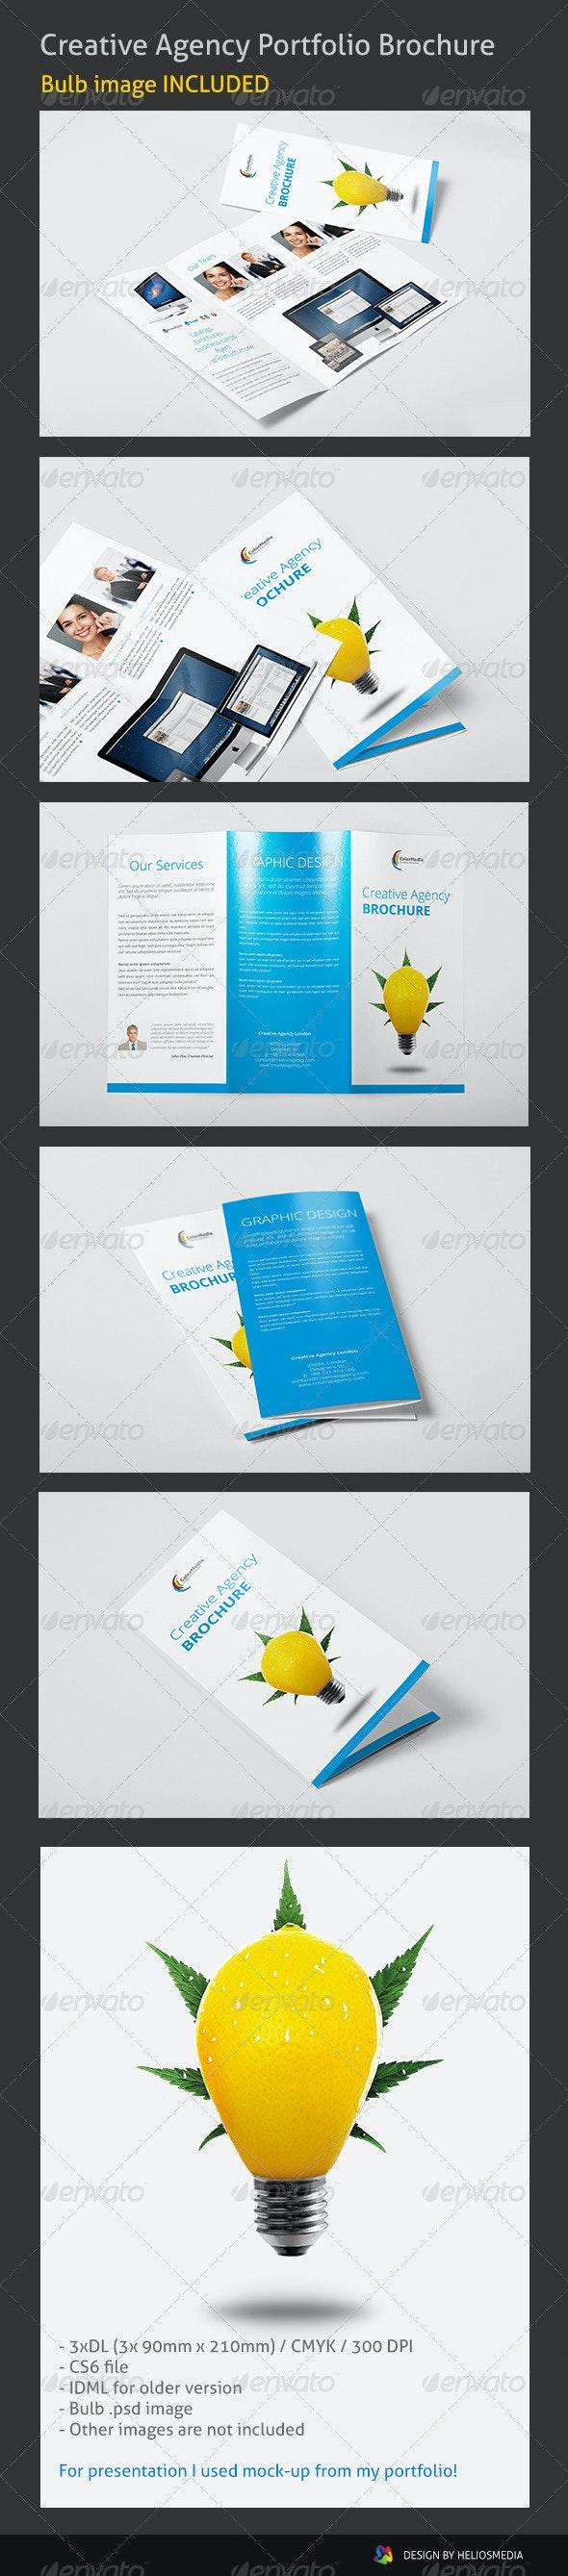 Tri-Fold Creative Agency Brochure - Corporate Brochures